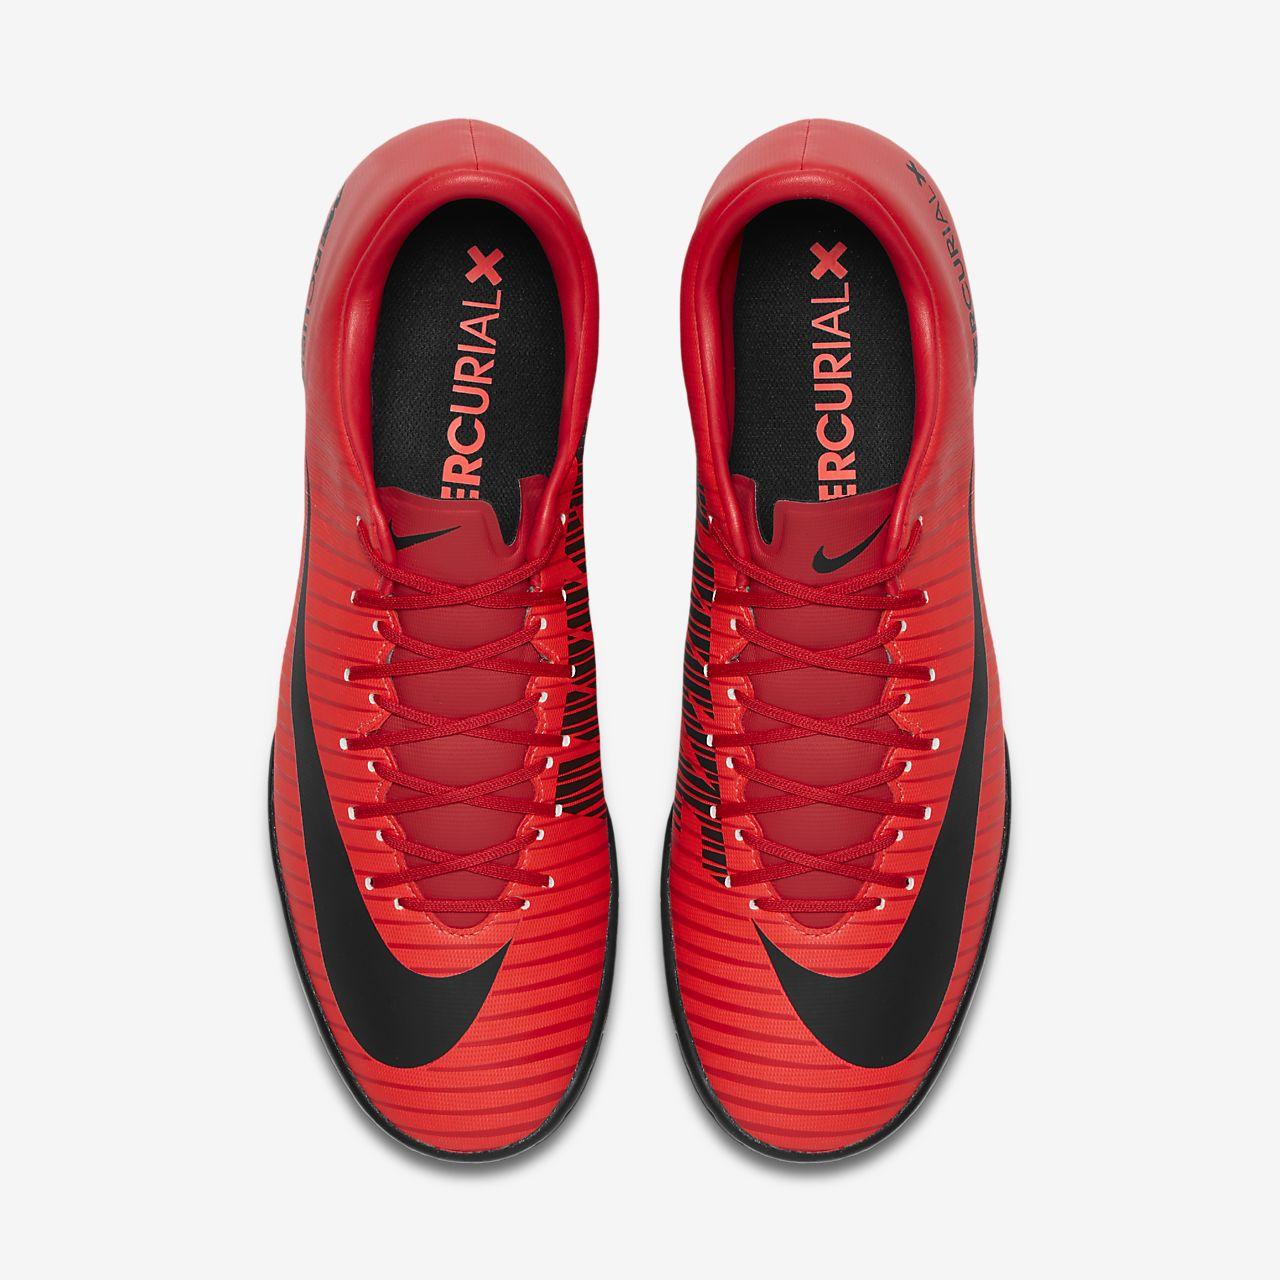 3c5js4qrla Ic Foot En Viii Chaussures Mercurial Salle Noir Victory Nike ZiOkuPX